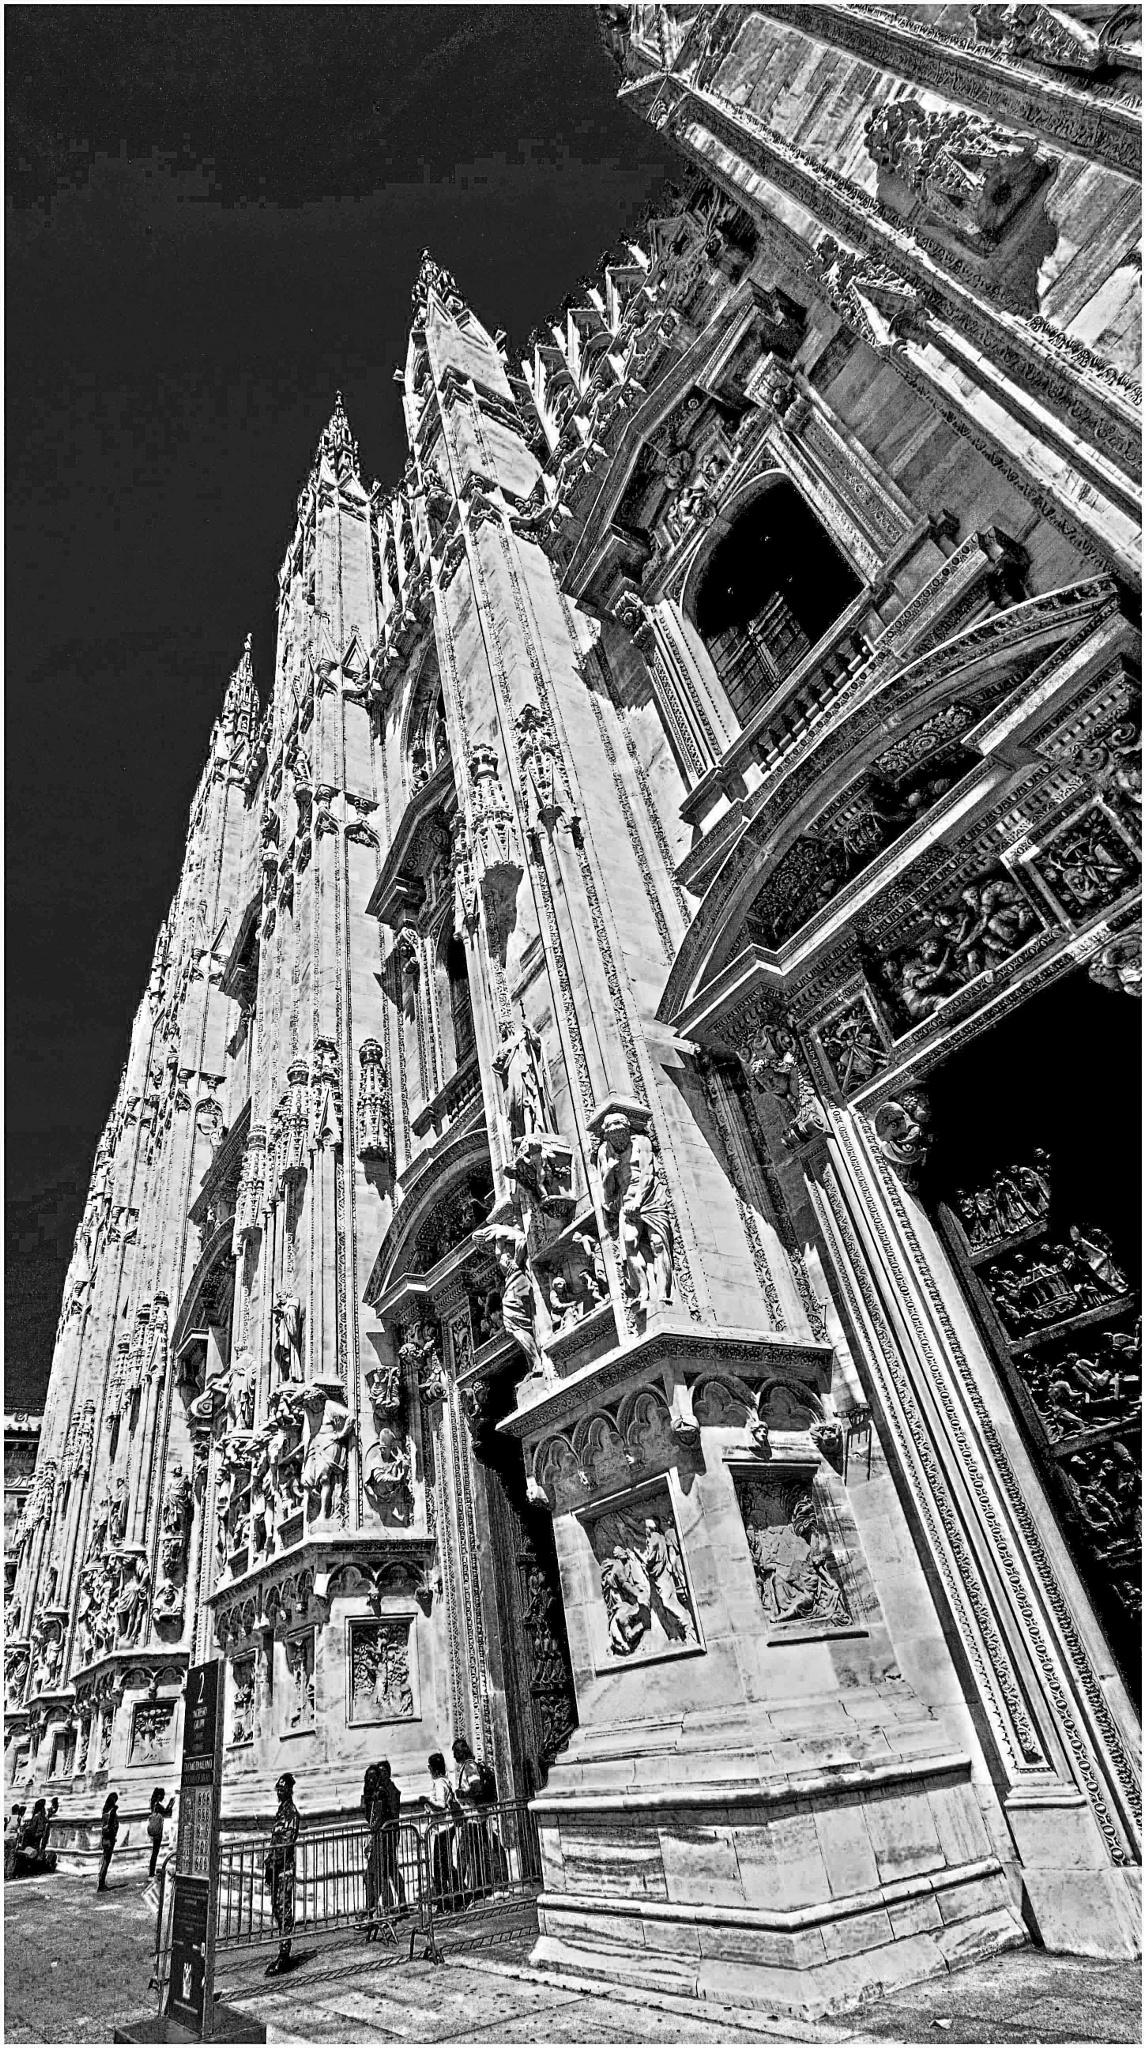 Duomo by Maurizio